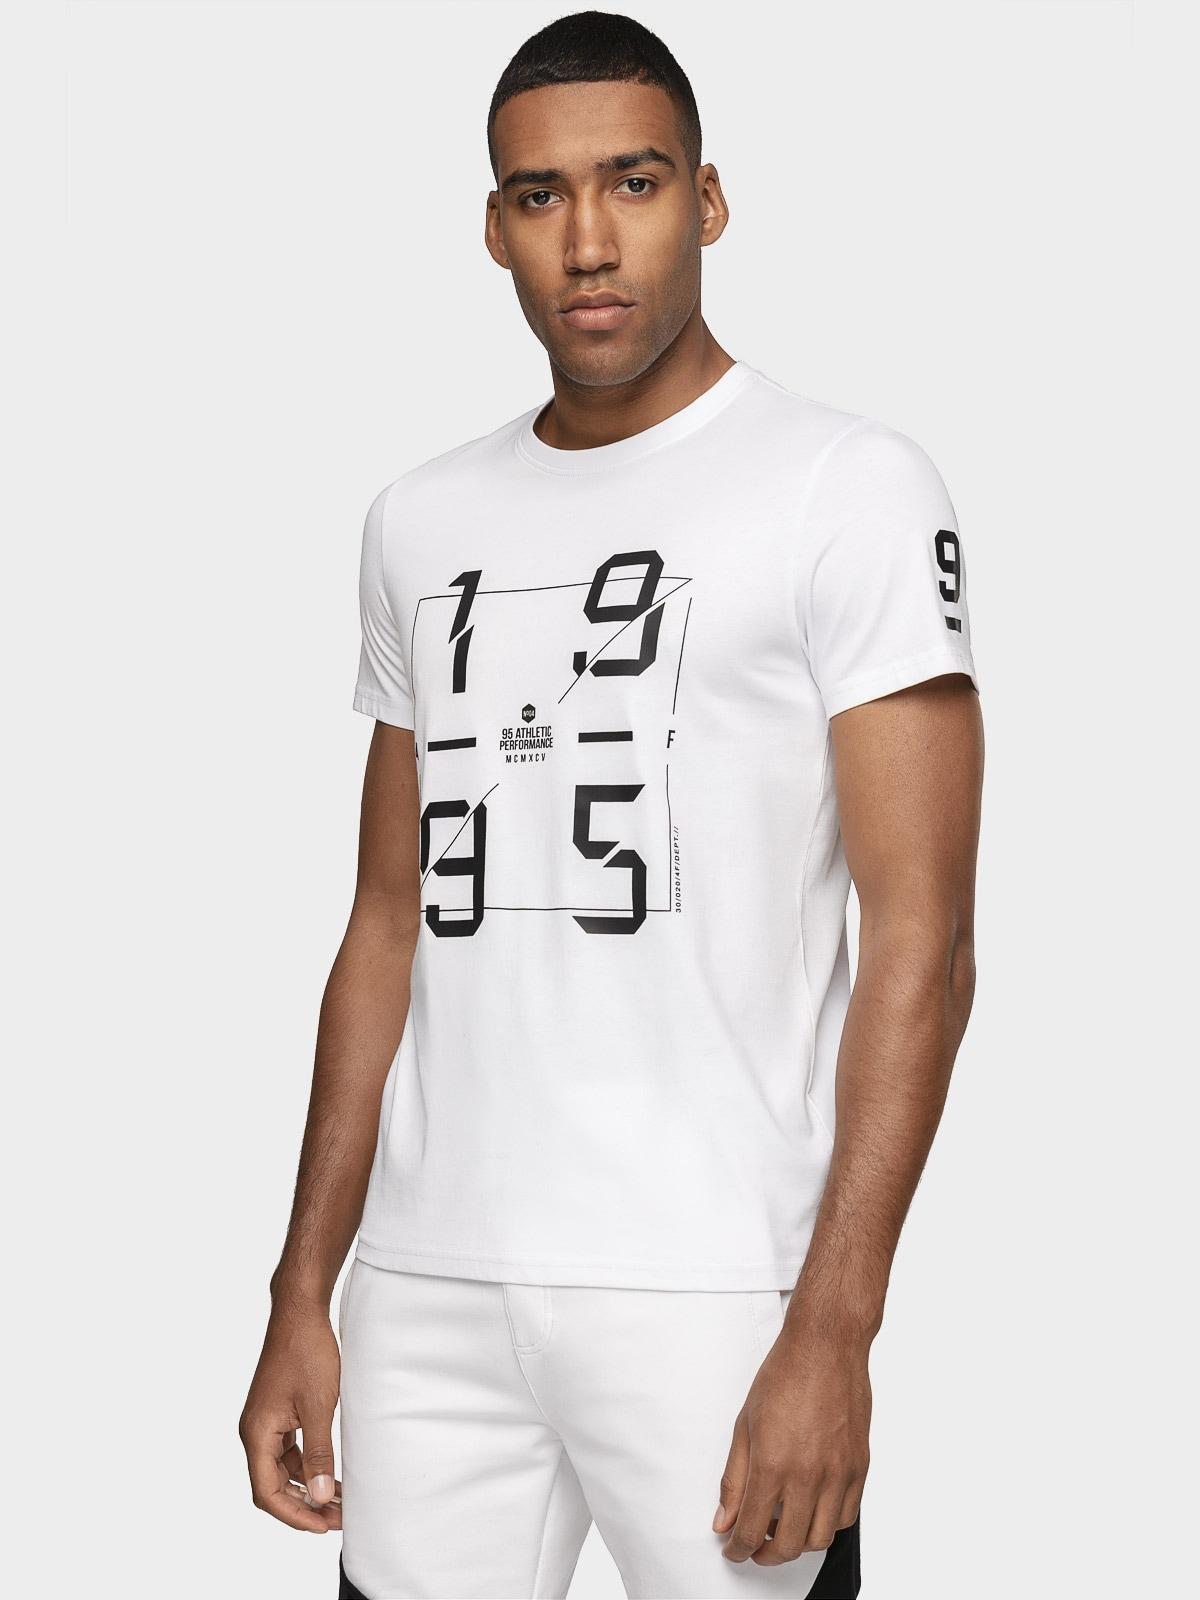 Tricou pentru bărbați TSM073 - alb